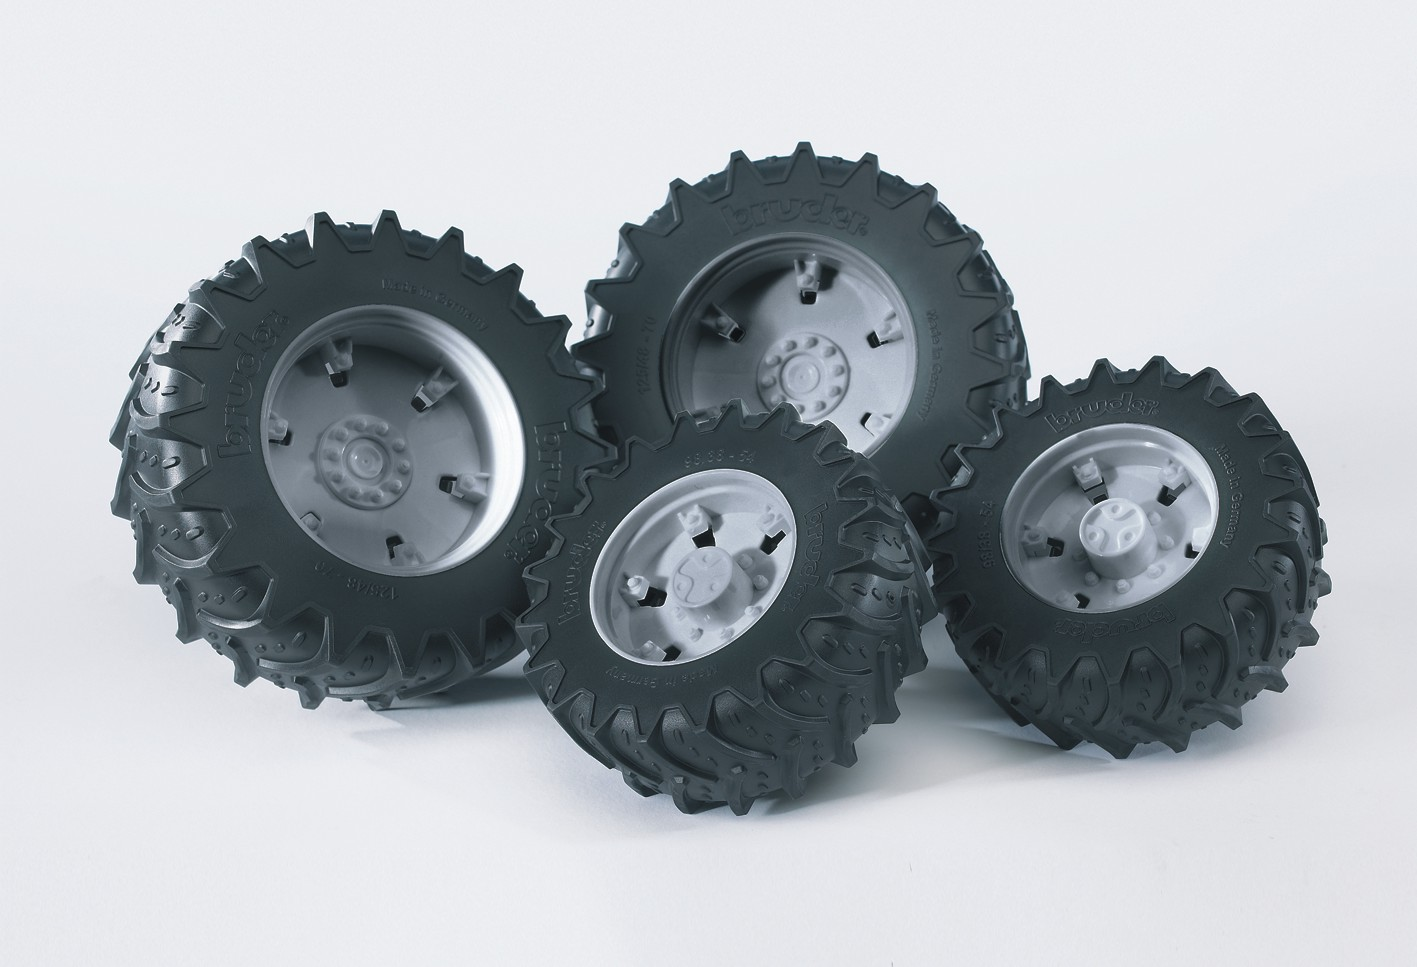 Bruder. Шины для системы сдвоенных колес с серыми дискамиАксессуары<br>Bruder. Шины для системы сдвоенных колес с серыми дисками<br>